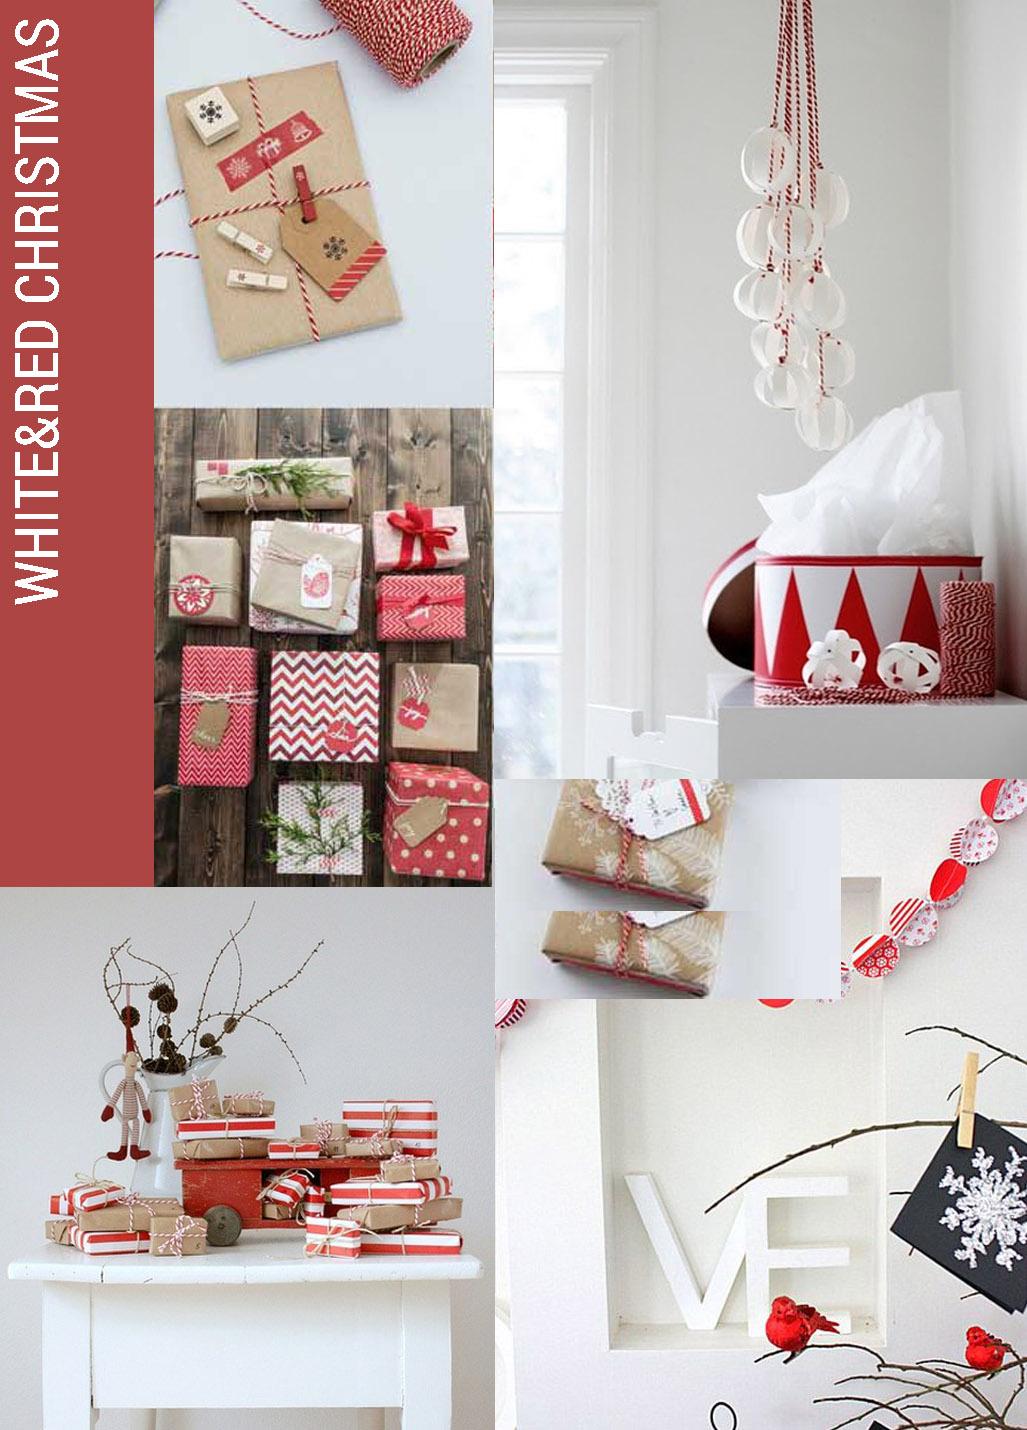 christmas decor trend WHITE RED, Christmas decor trends, white red christmas